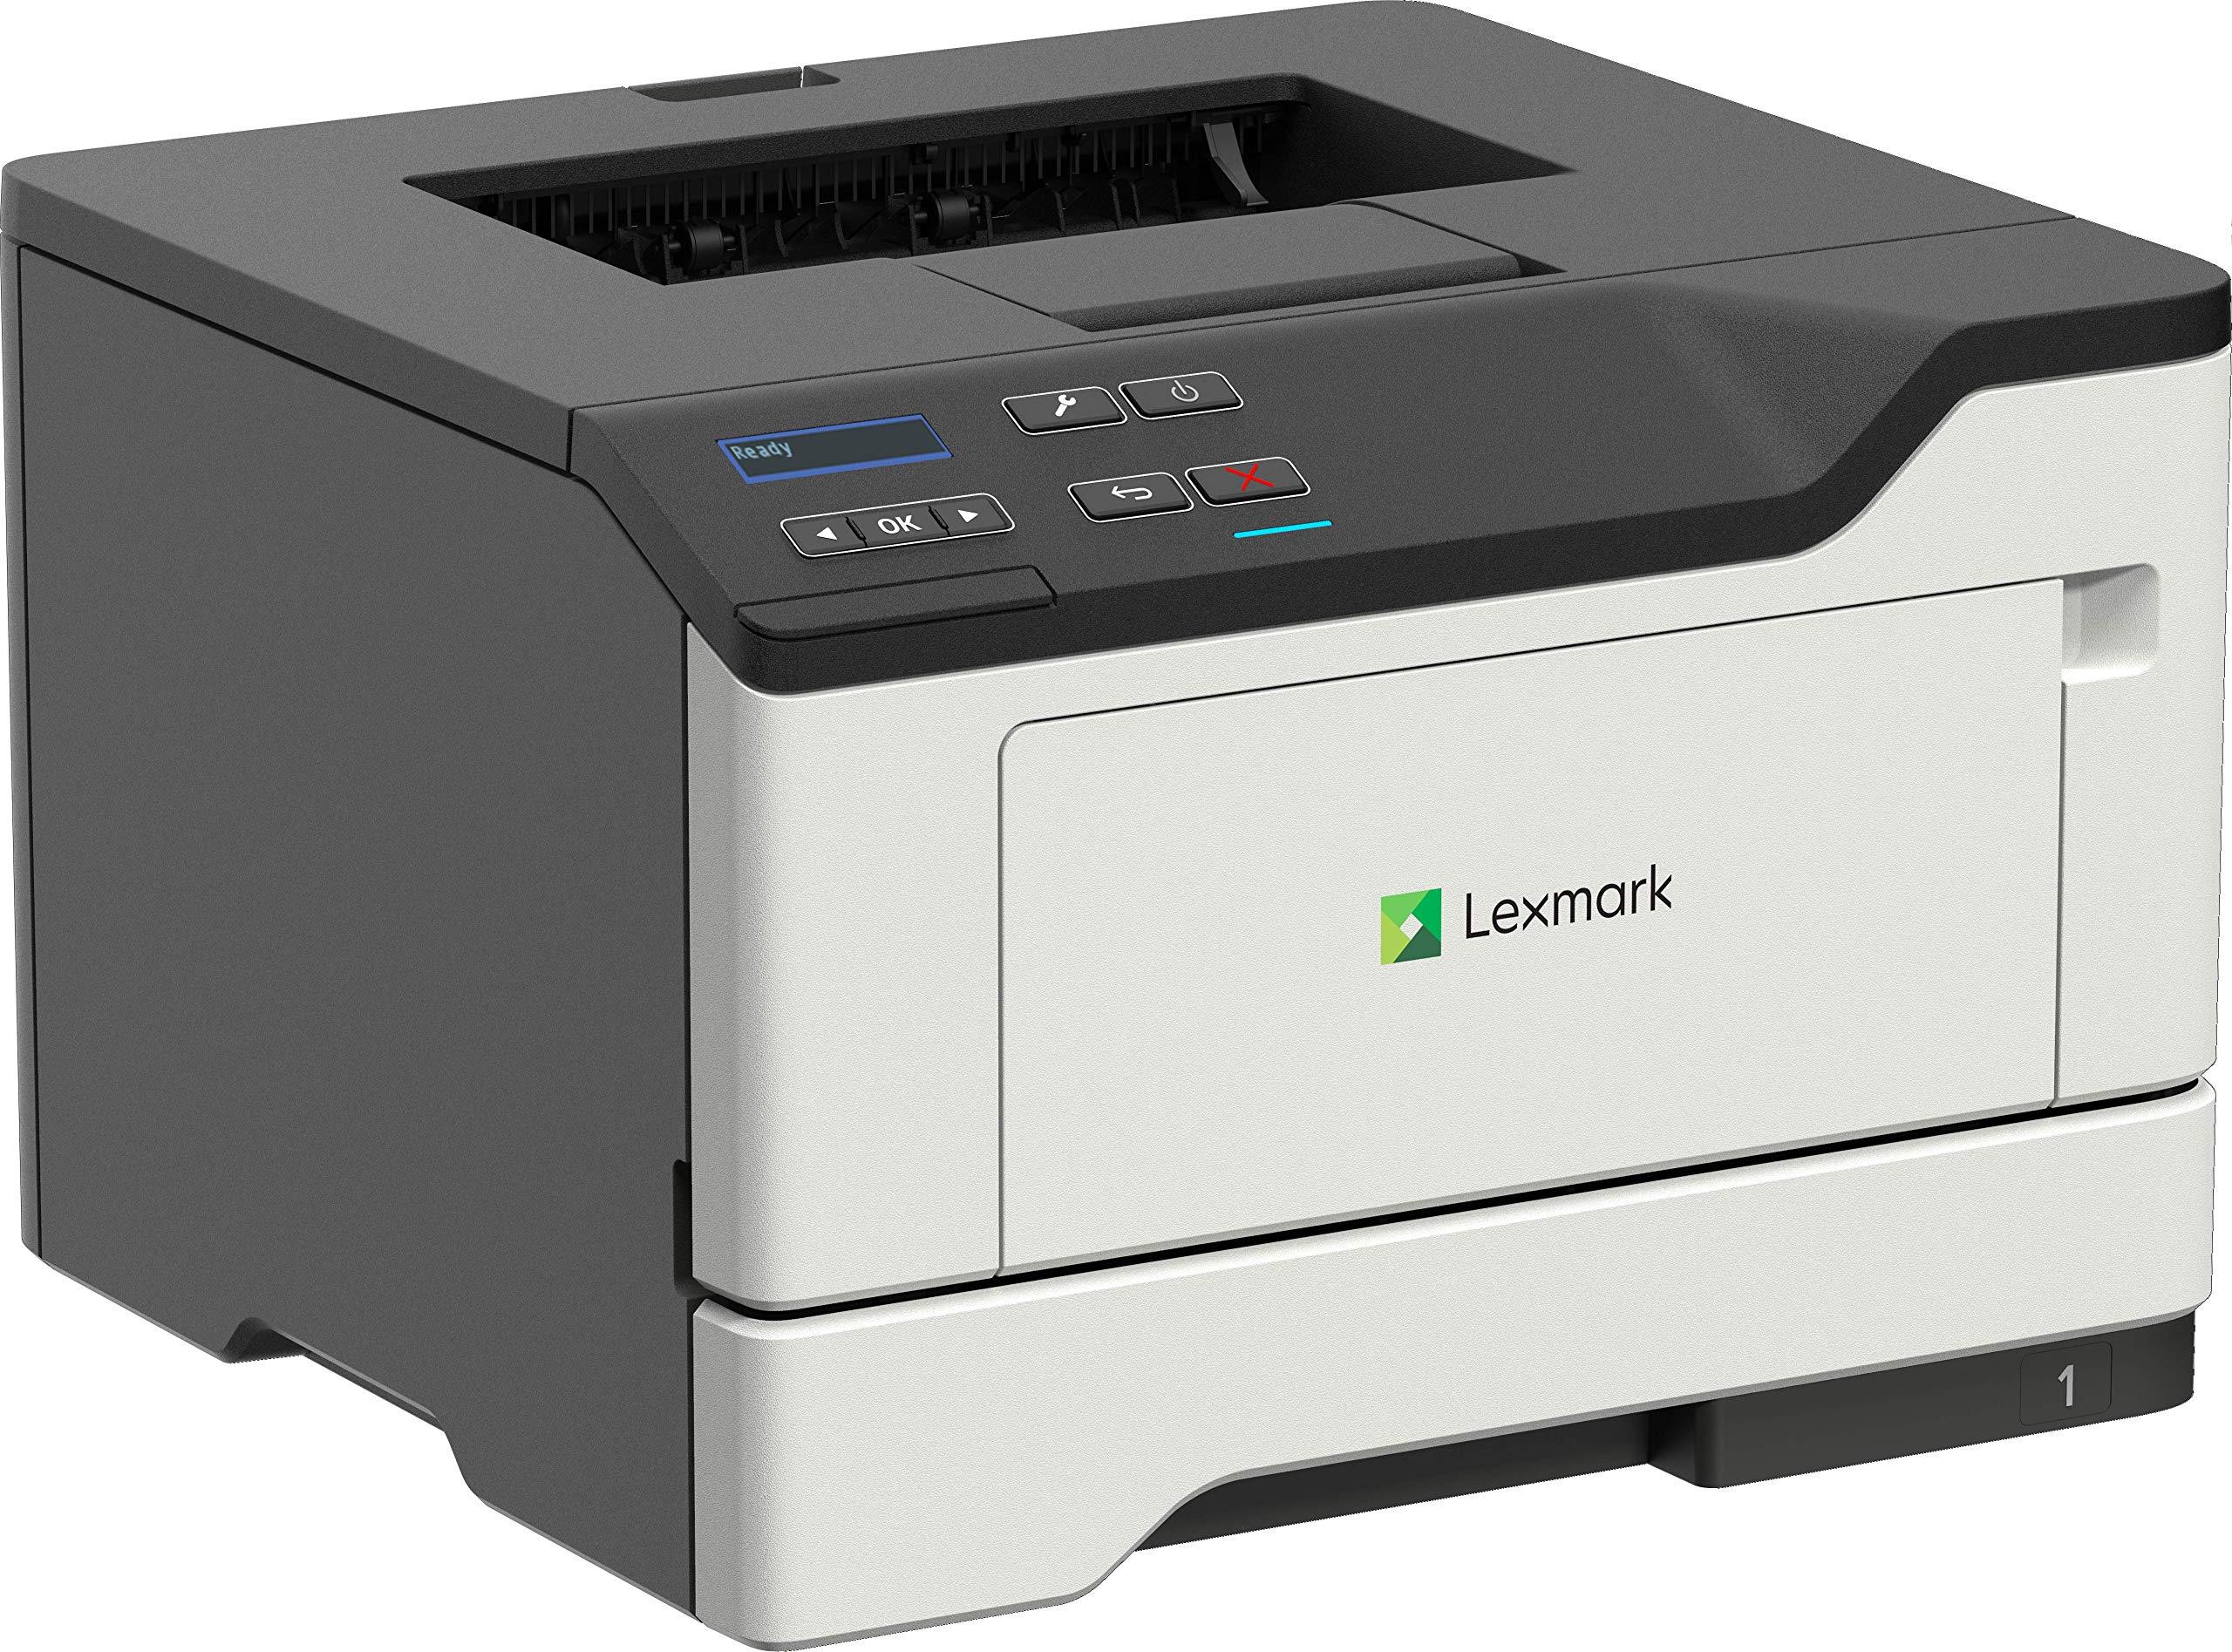 Lexmark B2442DW Monochrome Laser Printer with Duplex Printing Wi-Fi Airprint (36SC220)